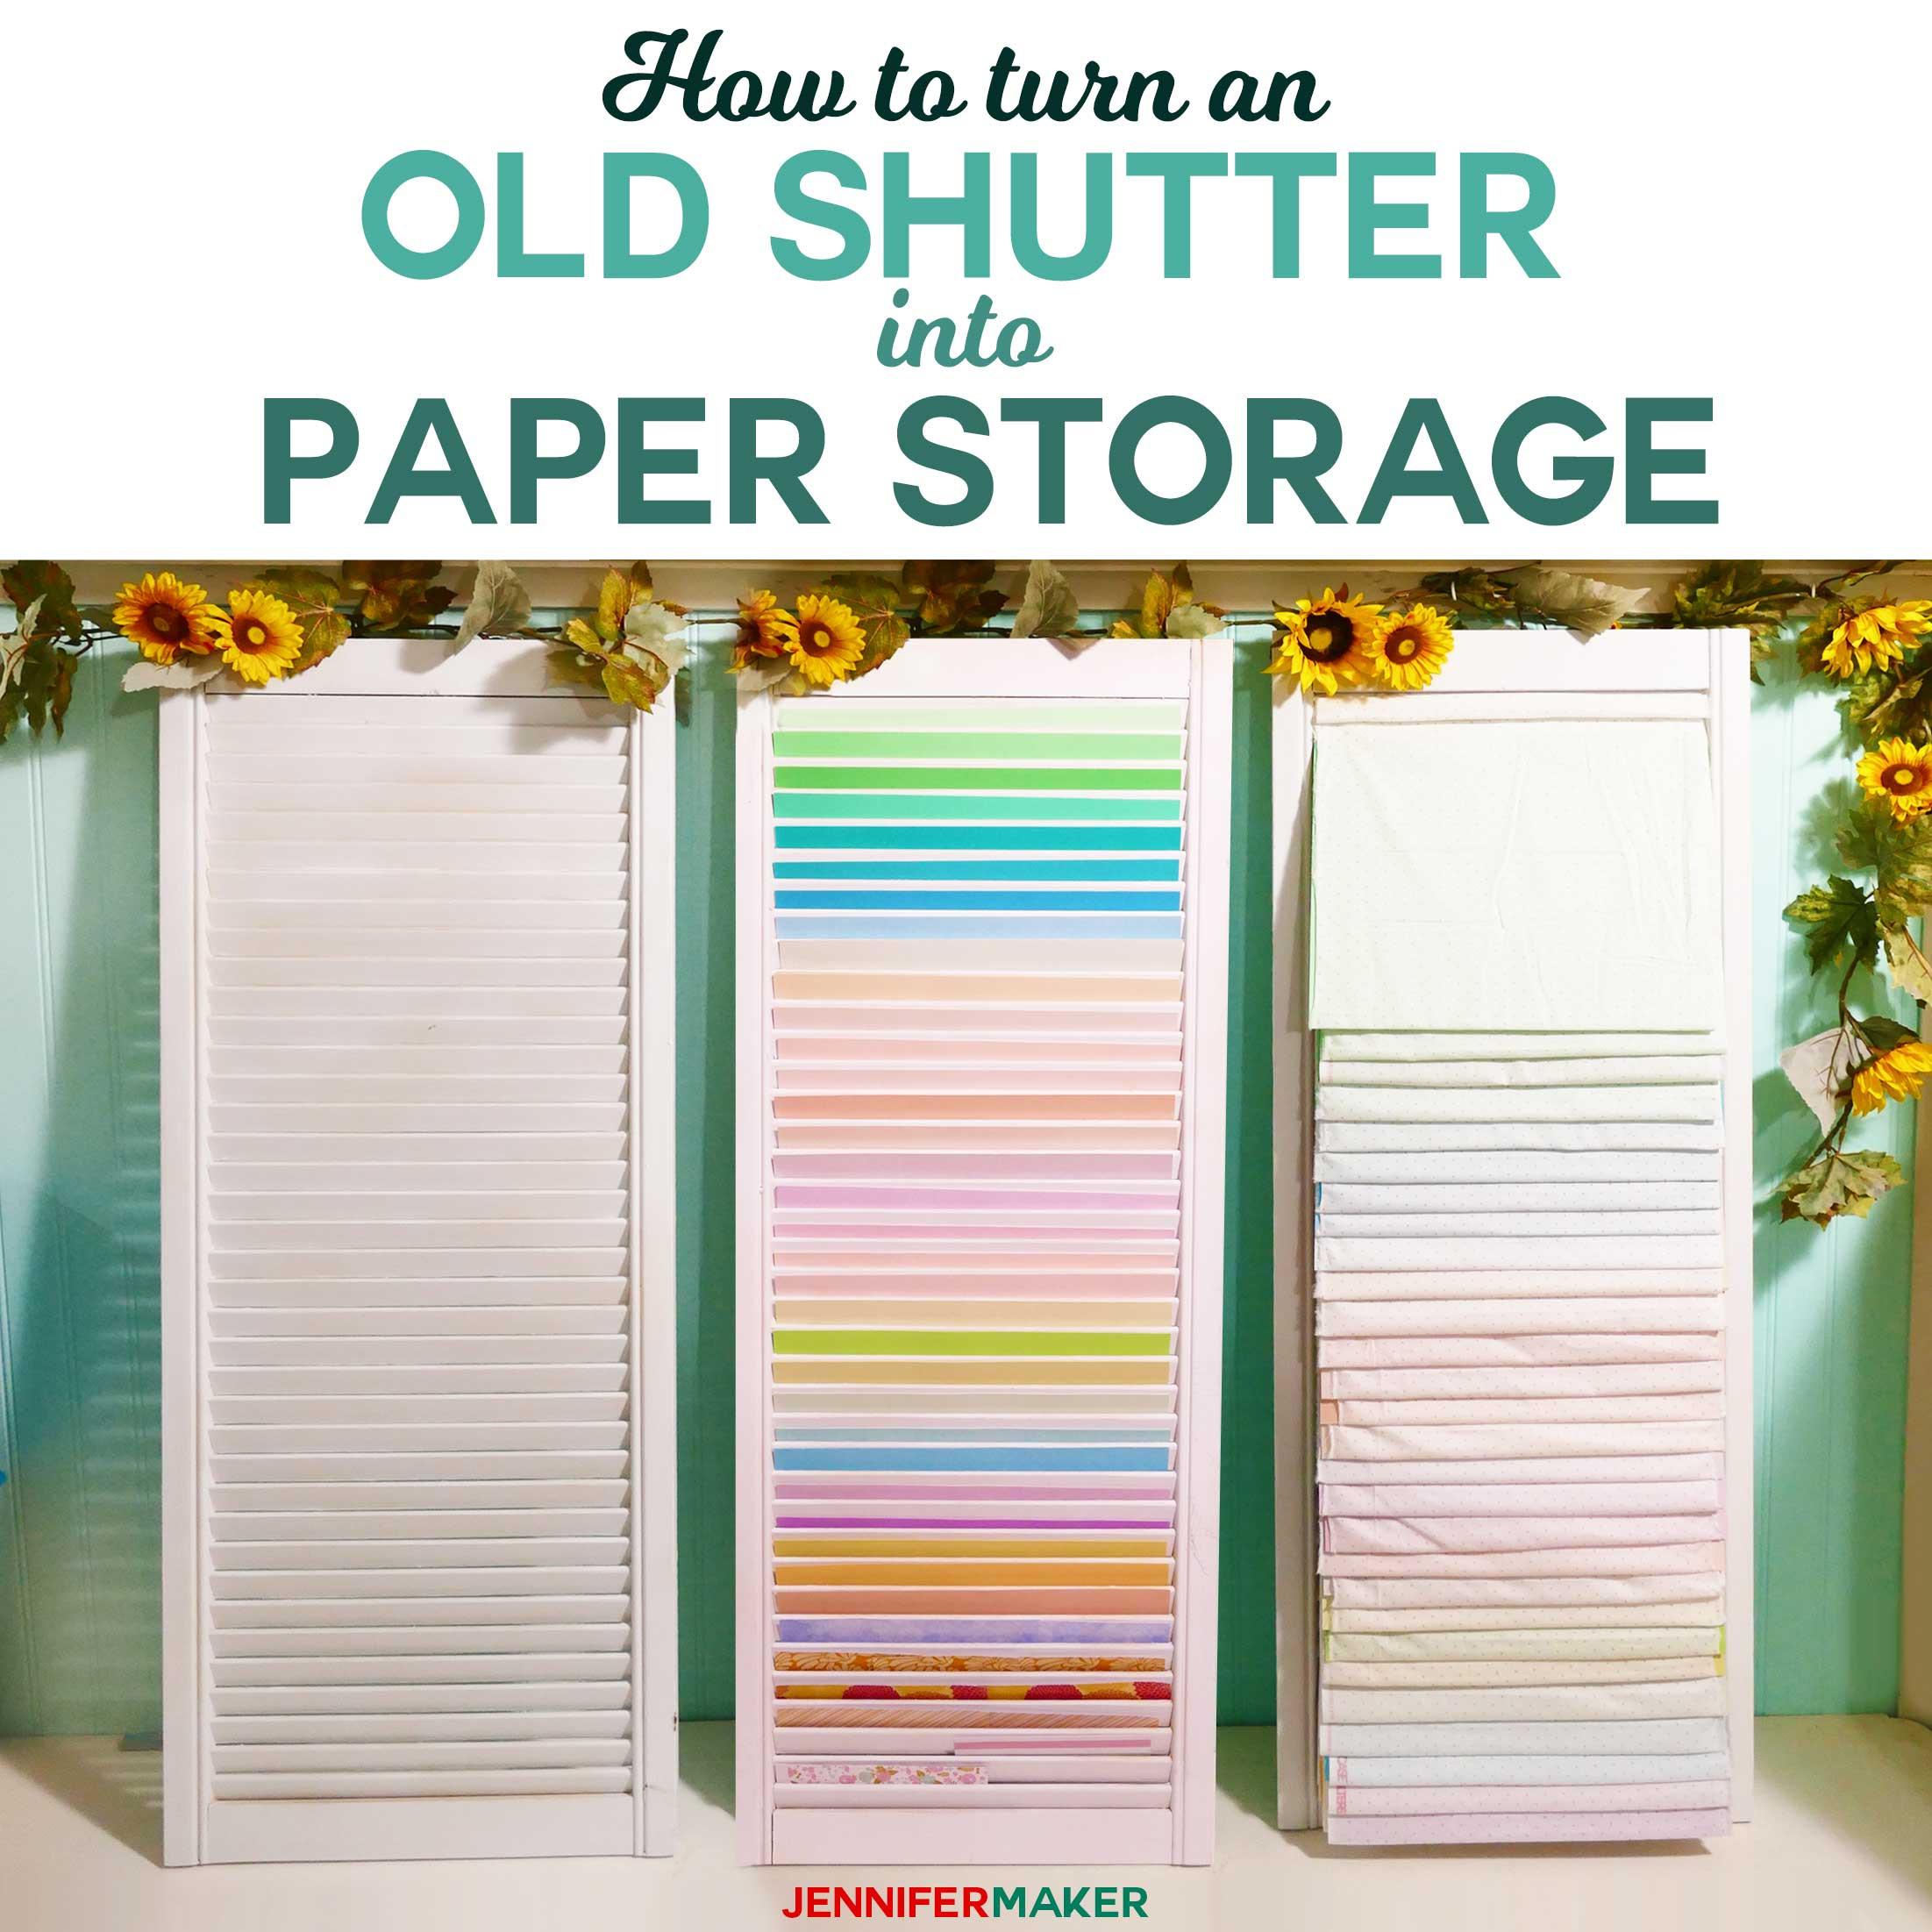 Paper Organizer DIY  DIY Paper Organizer Made from Repurposed Shutters